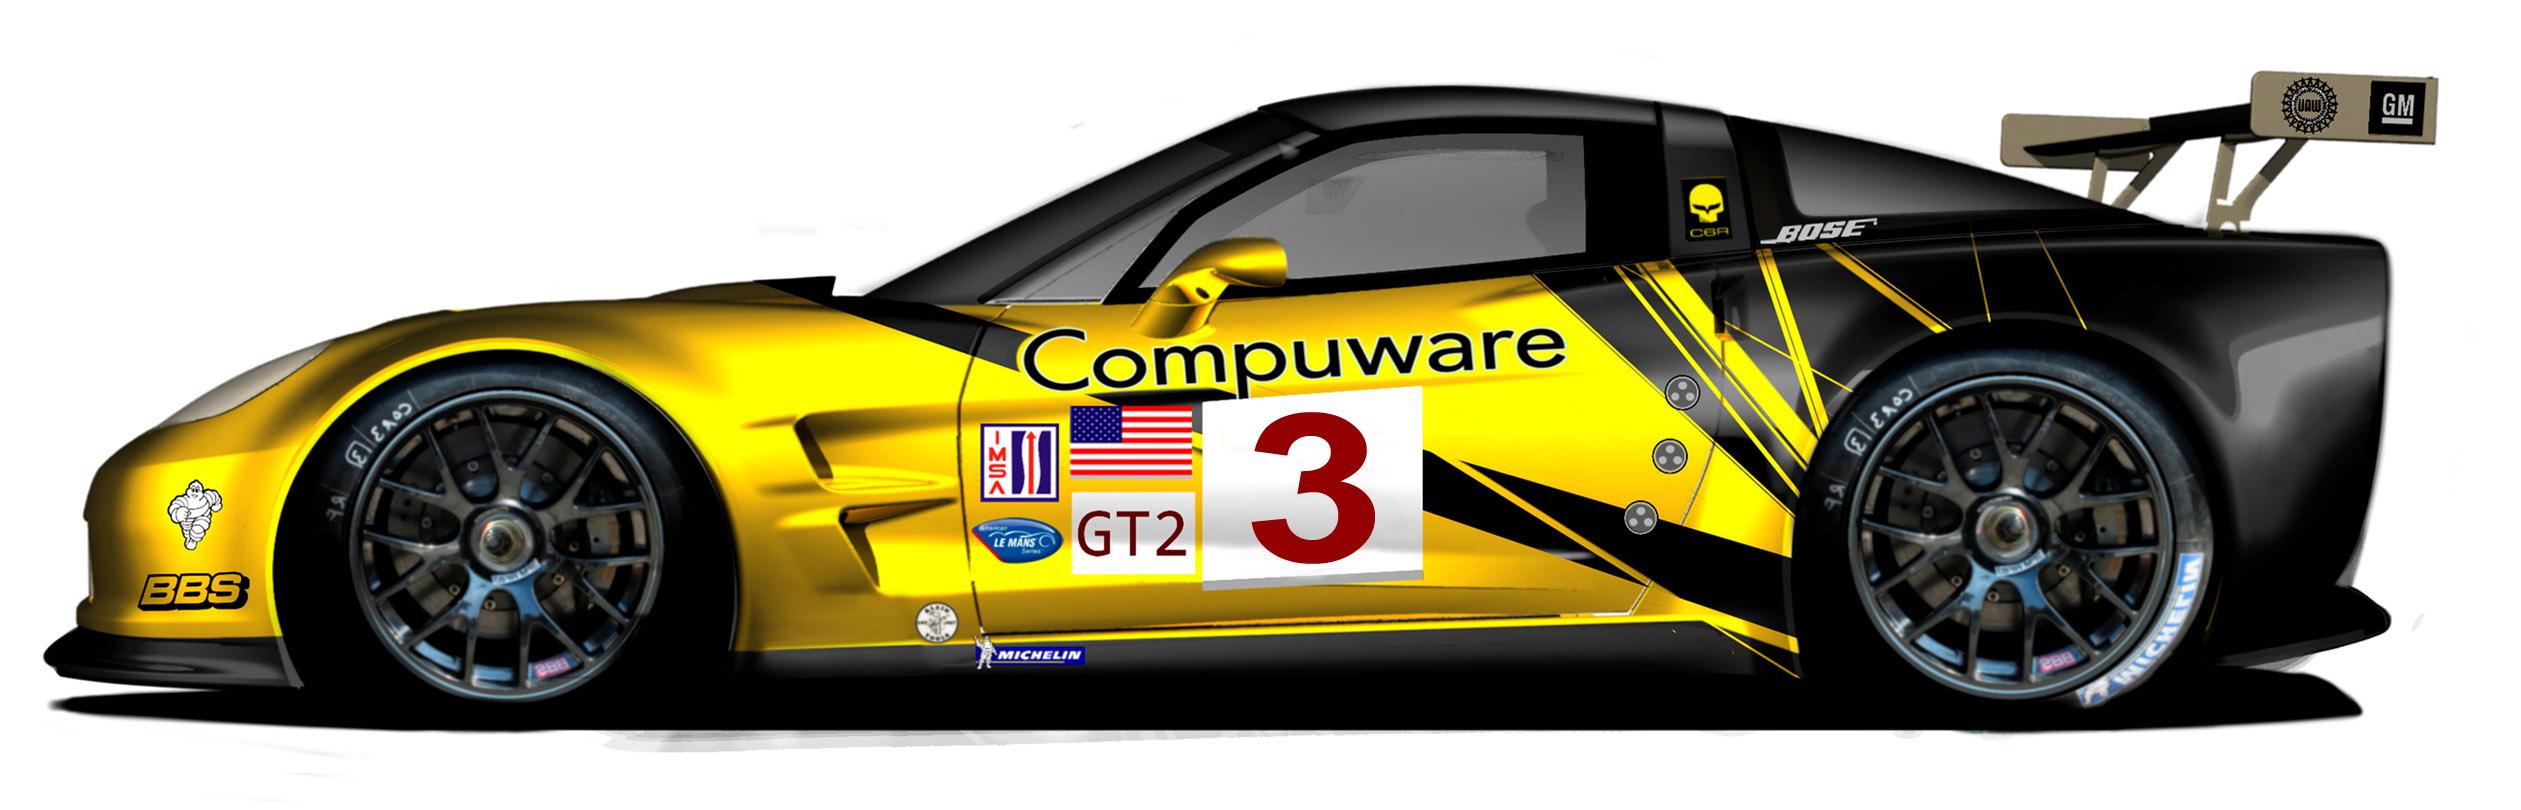 Kyosho Inferno GT2 ve de Trankilou & Trankilette - Page 3 Gt2-corvette-c6-r-15